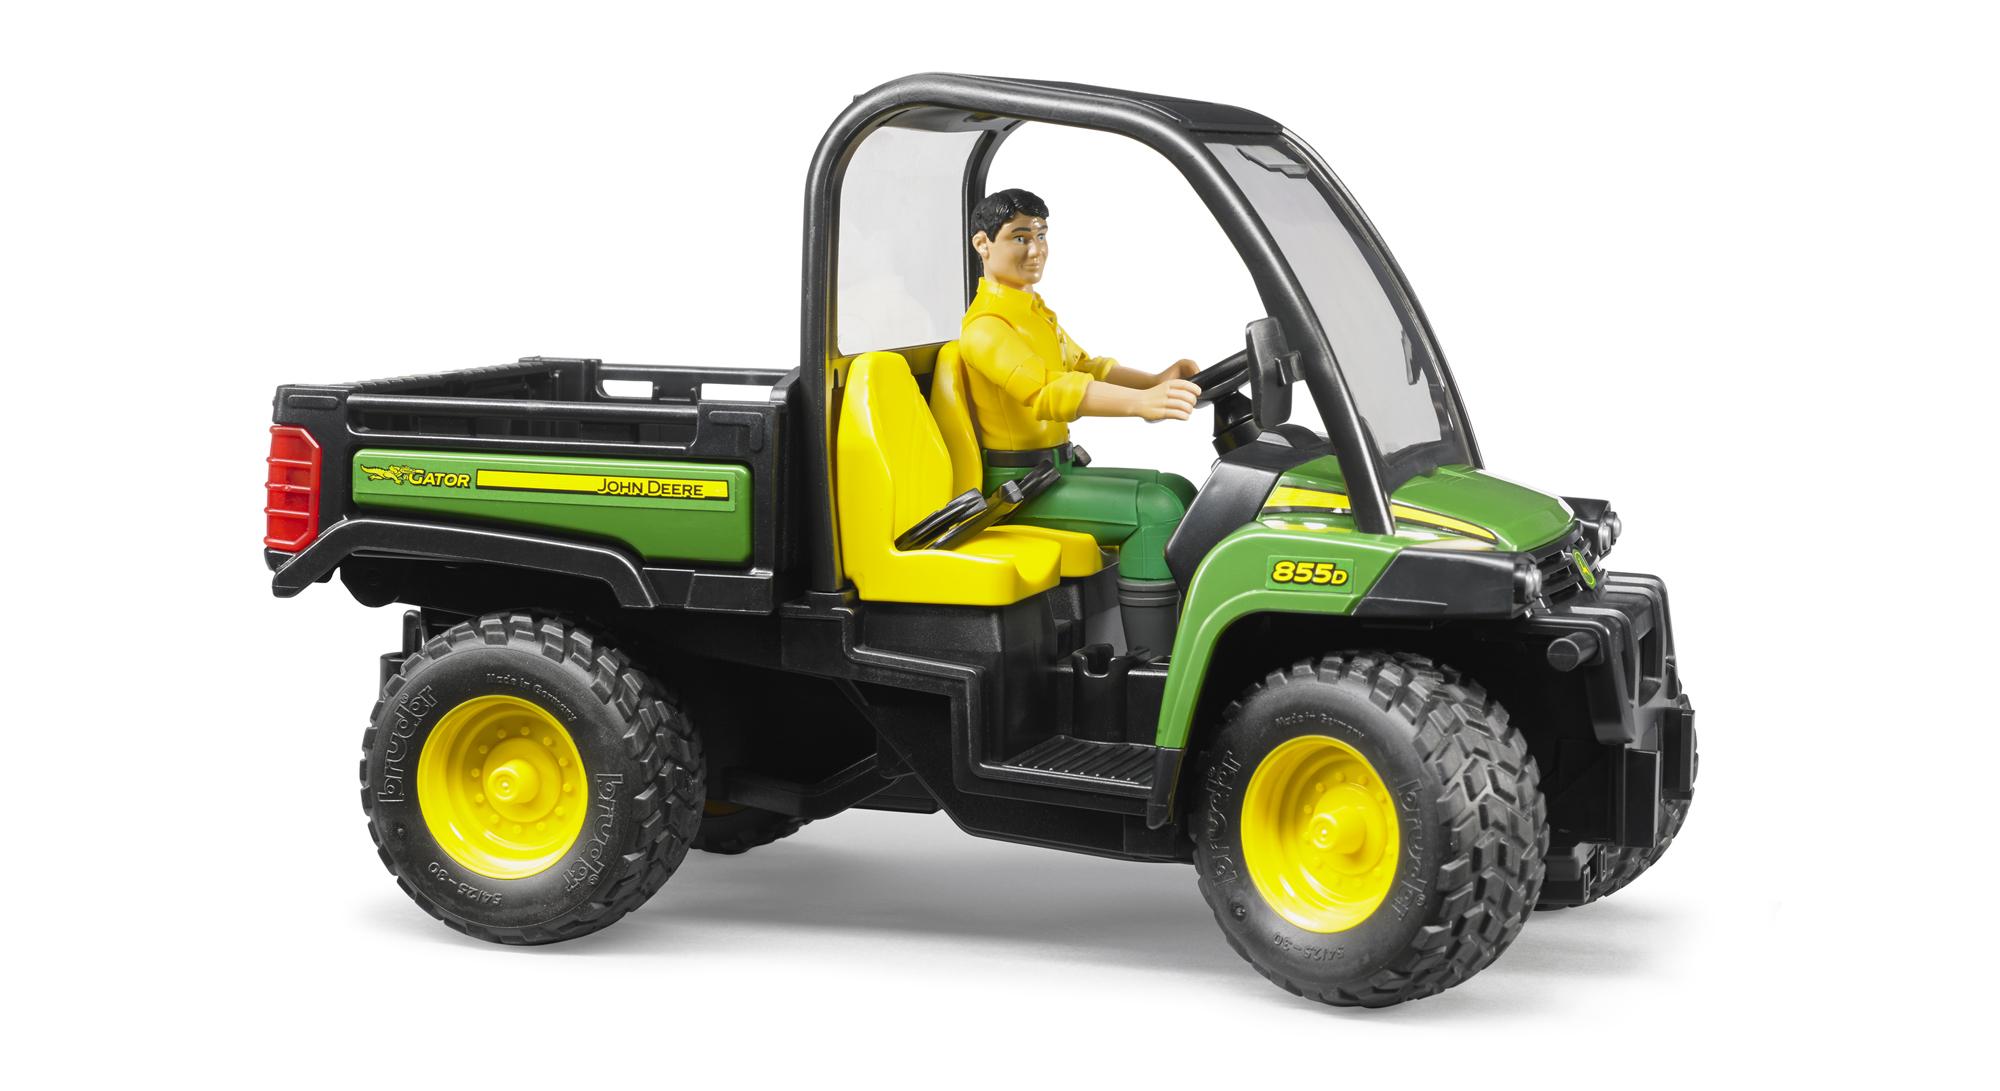 bruder john deere gator 855d  driver farm toy kids